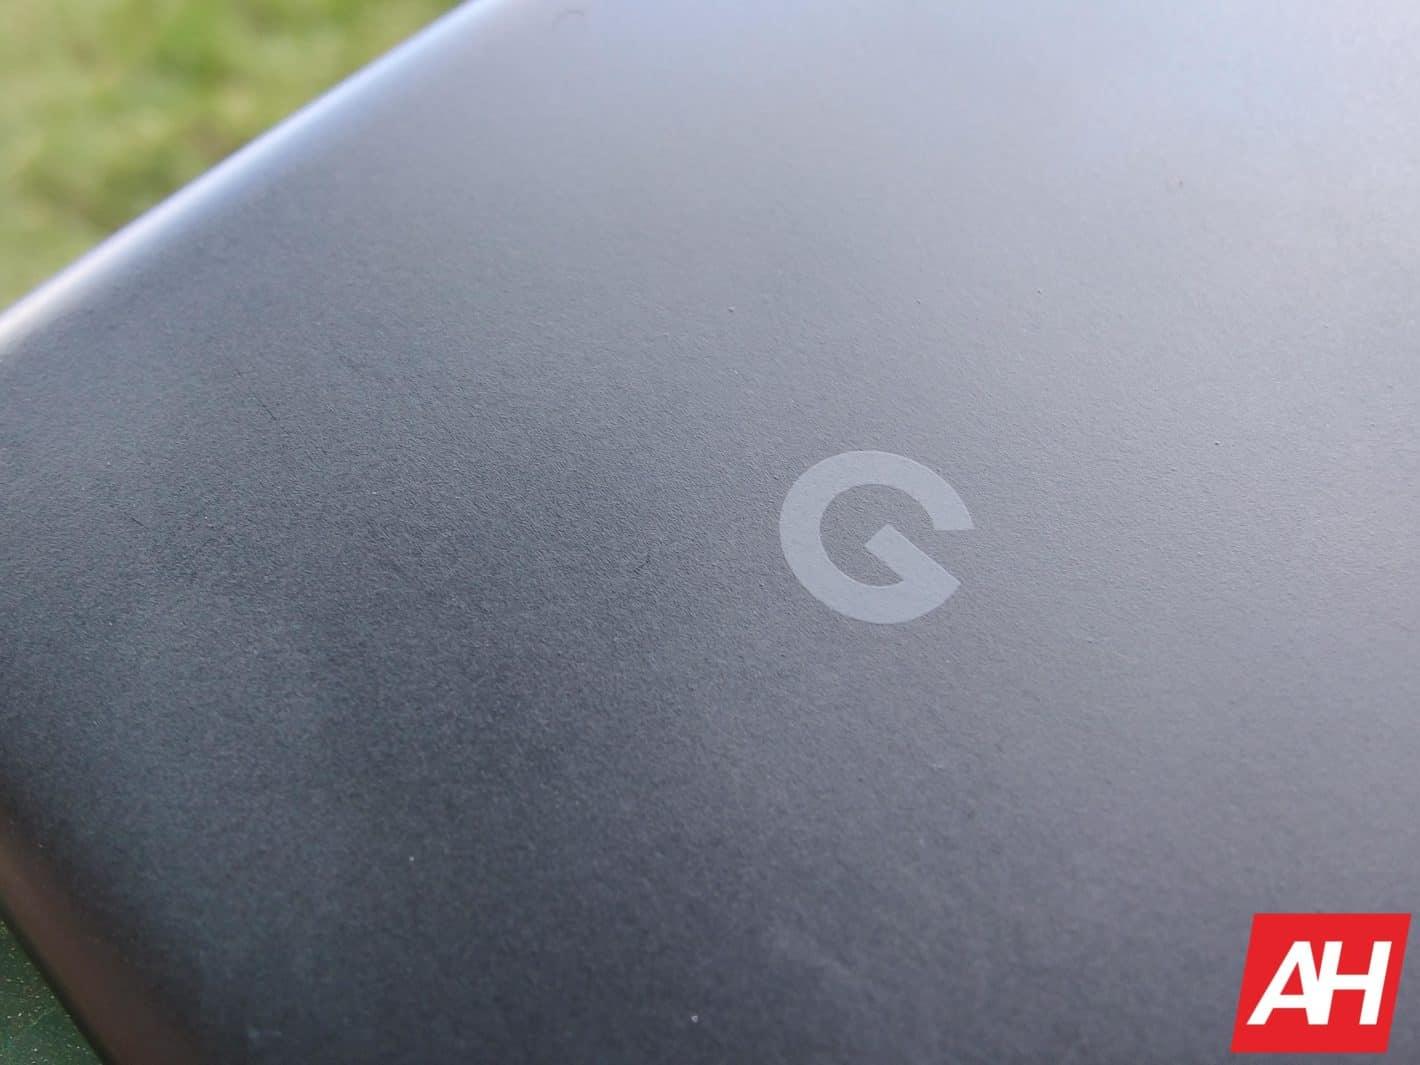 Google Pixel 4a Review AM AH 13